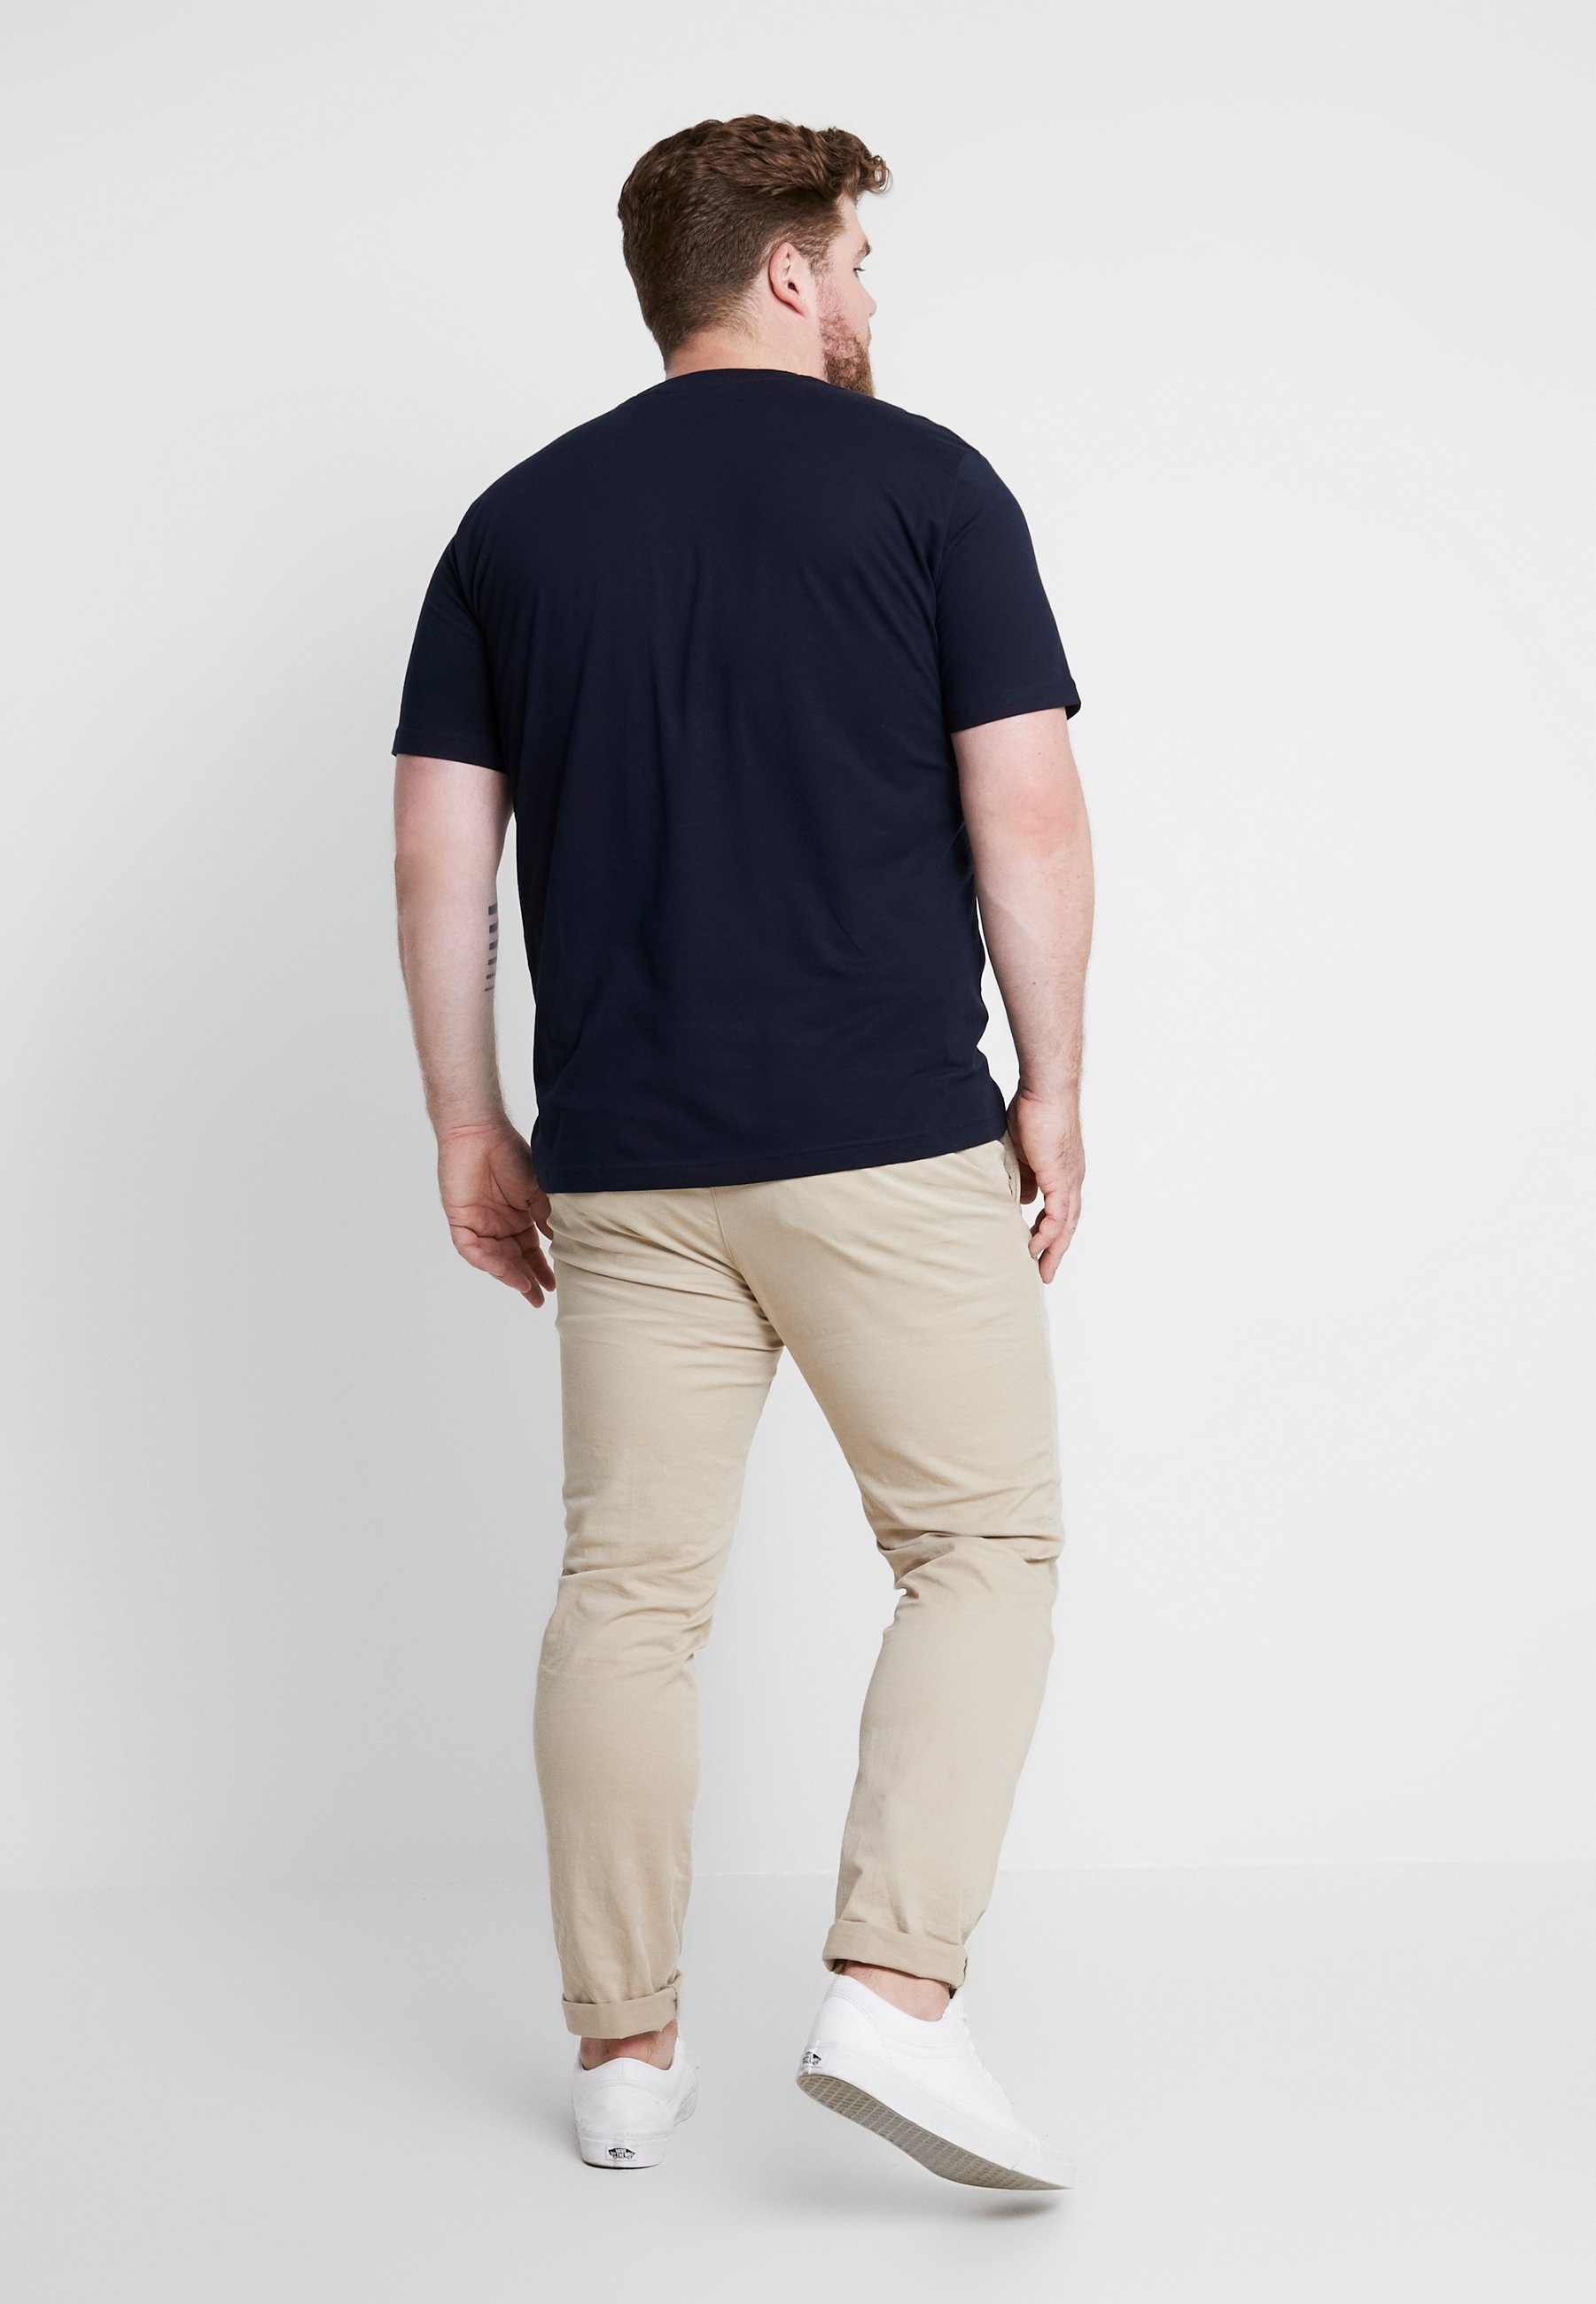 Fresh shirt Imprimé S KurzarmT oliver Ink OXwuiTkPZ